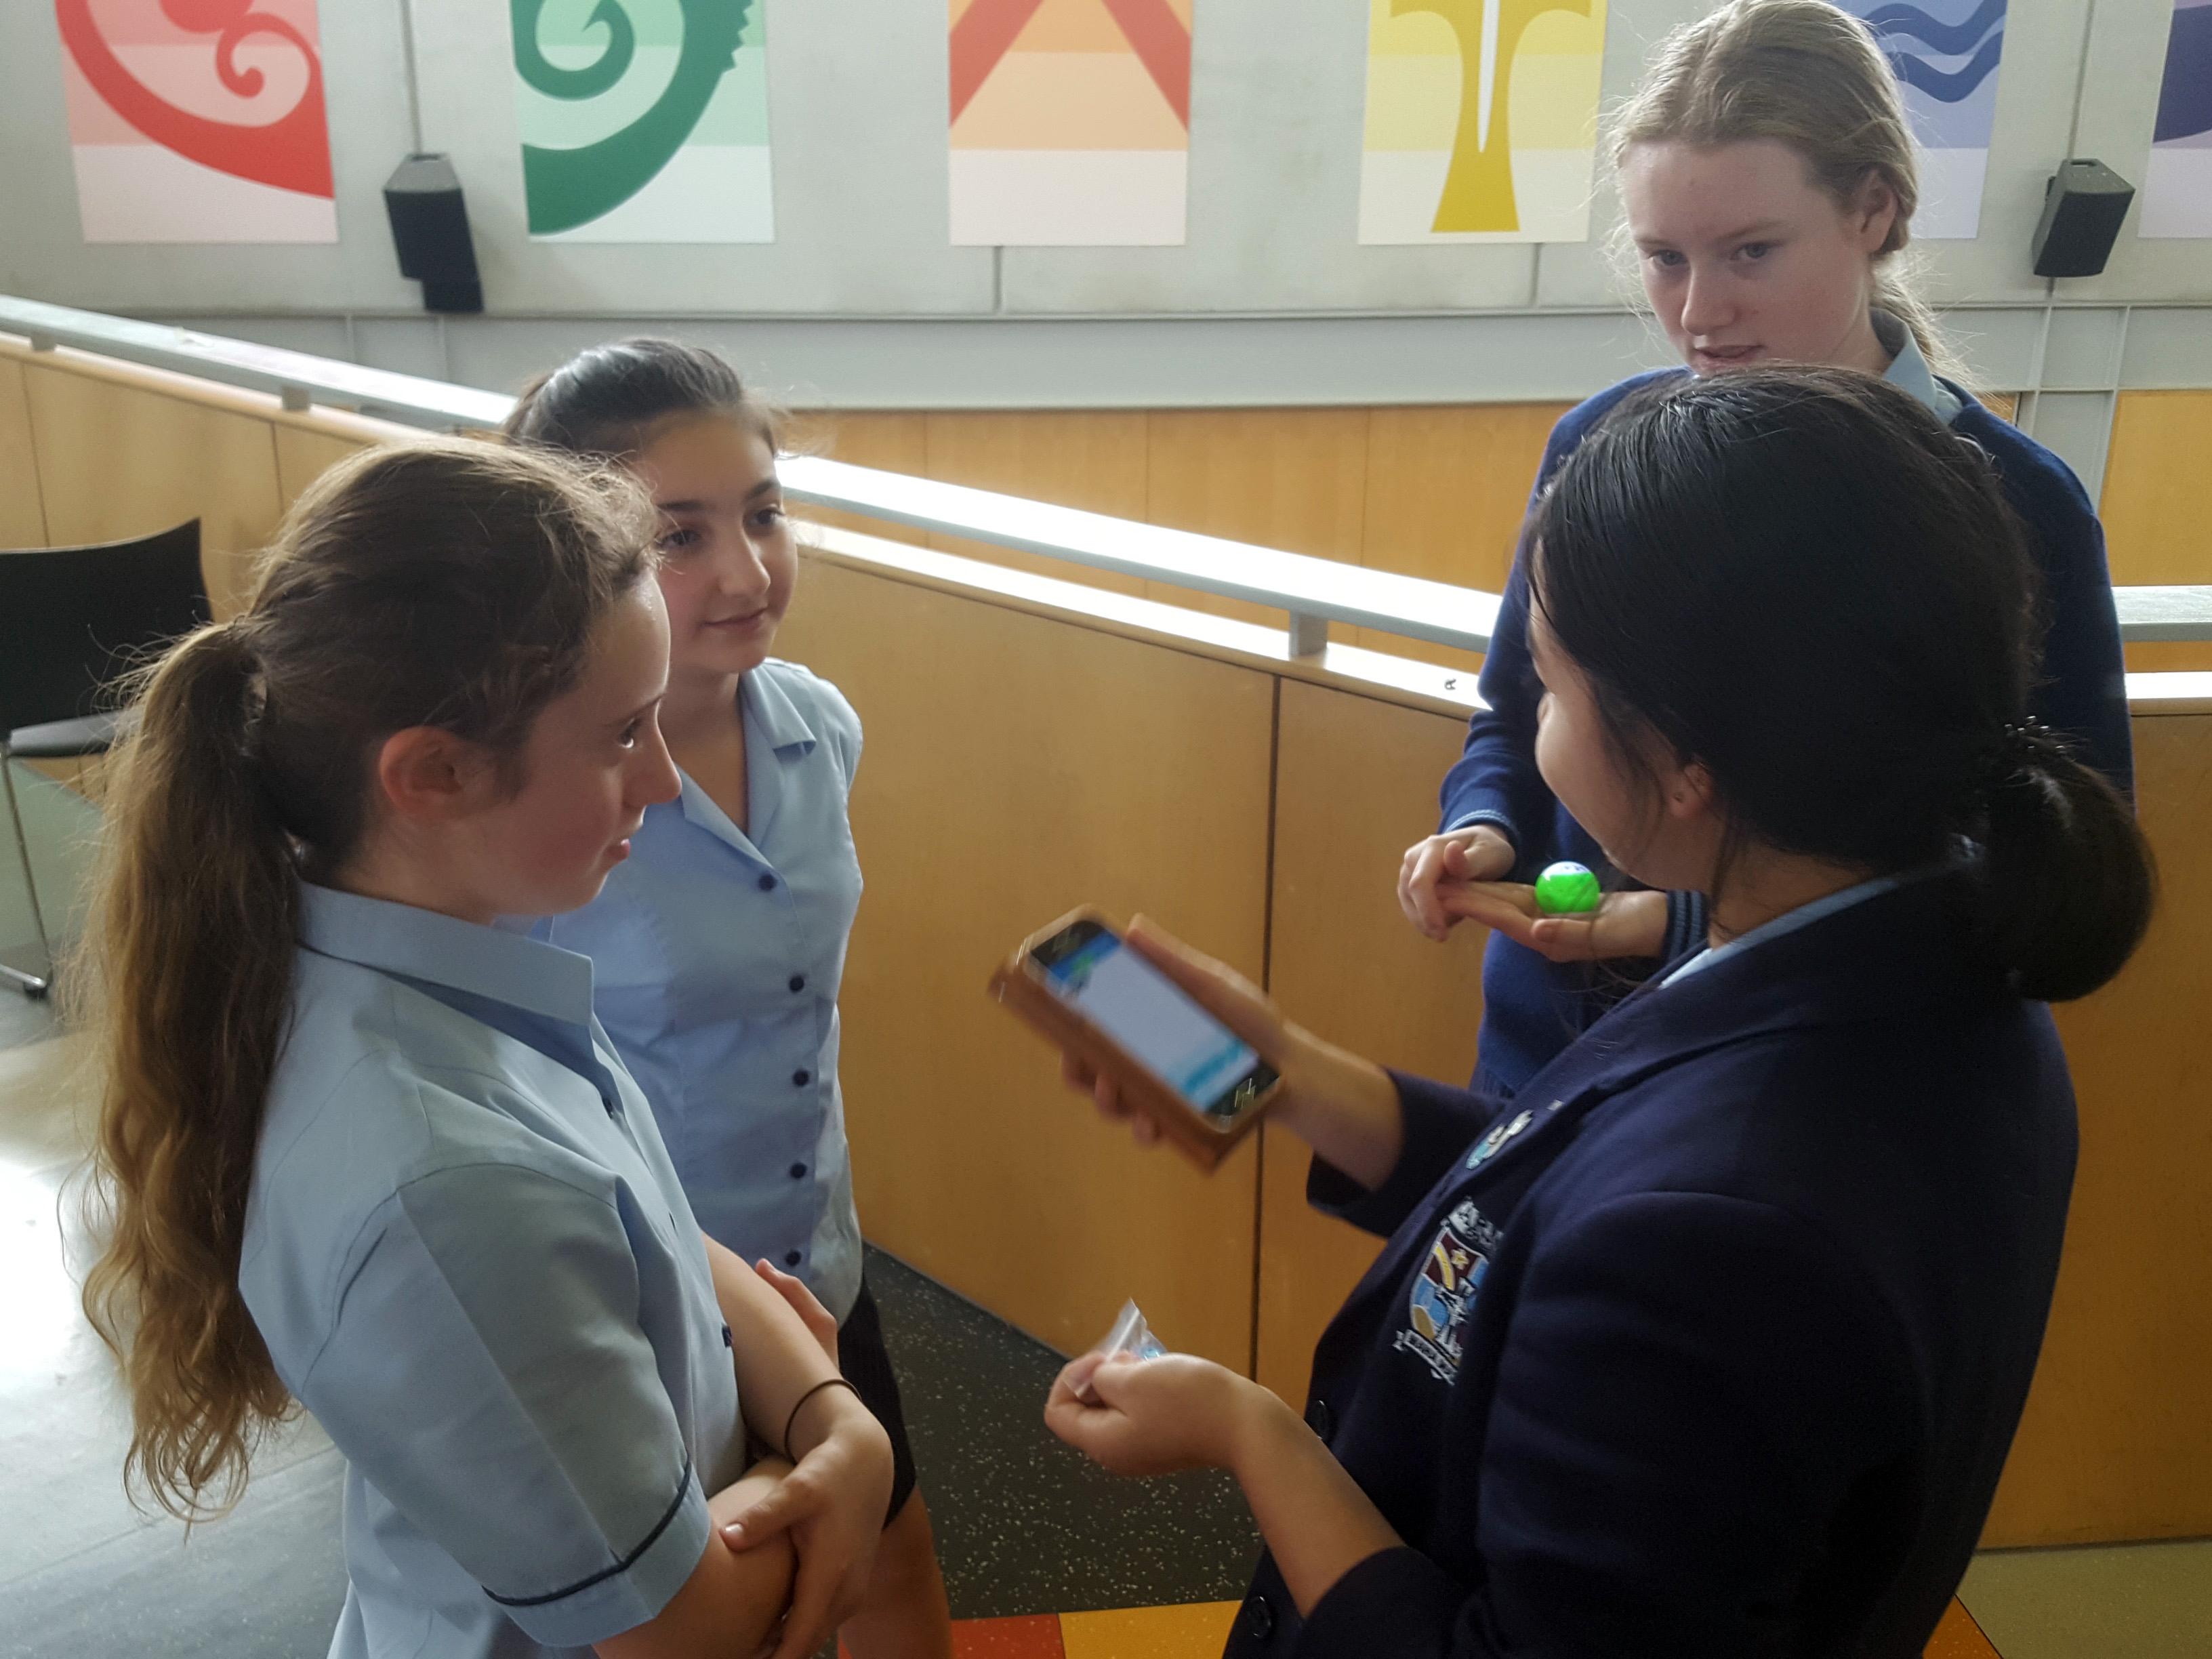 Year 10 Students Teach Year 7 Students Digital Technologies